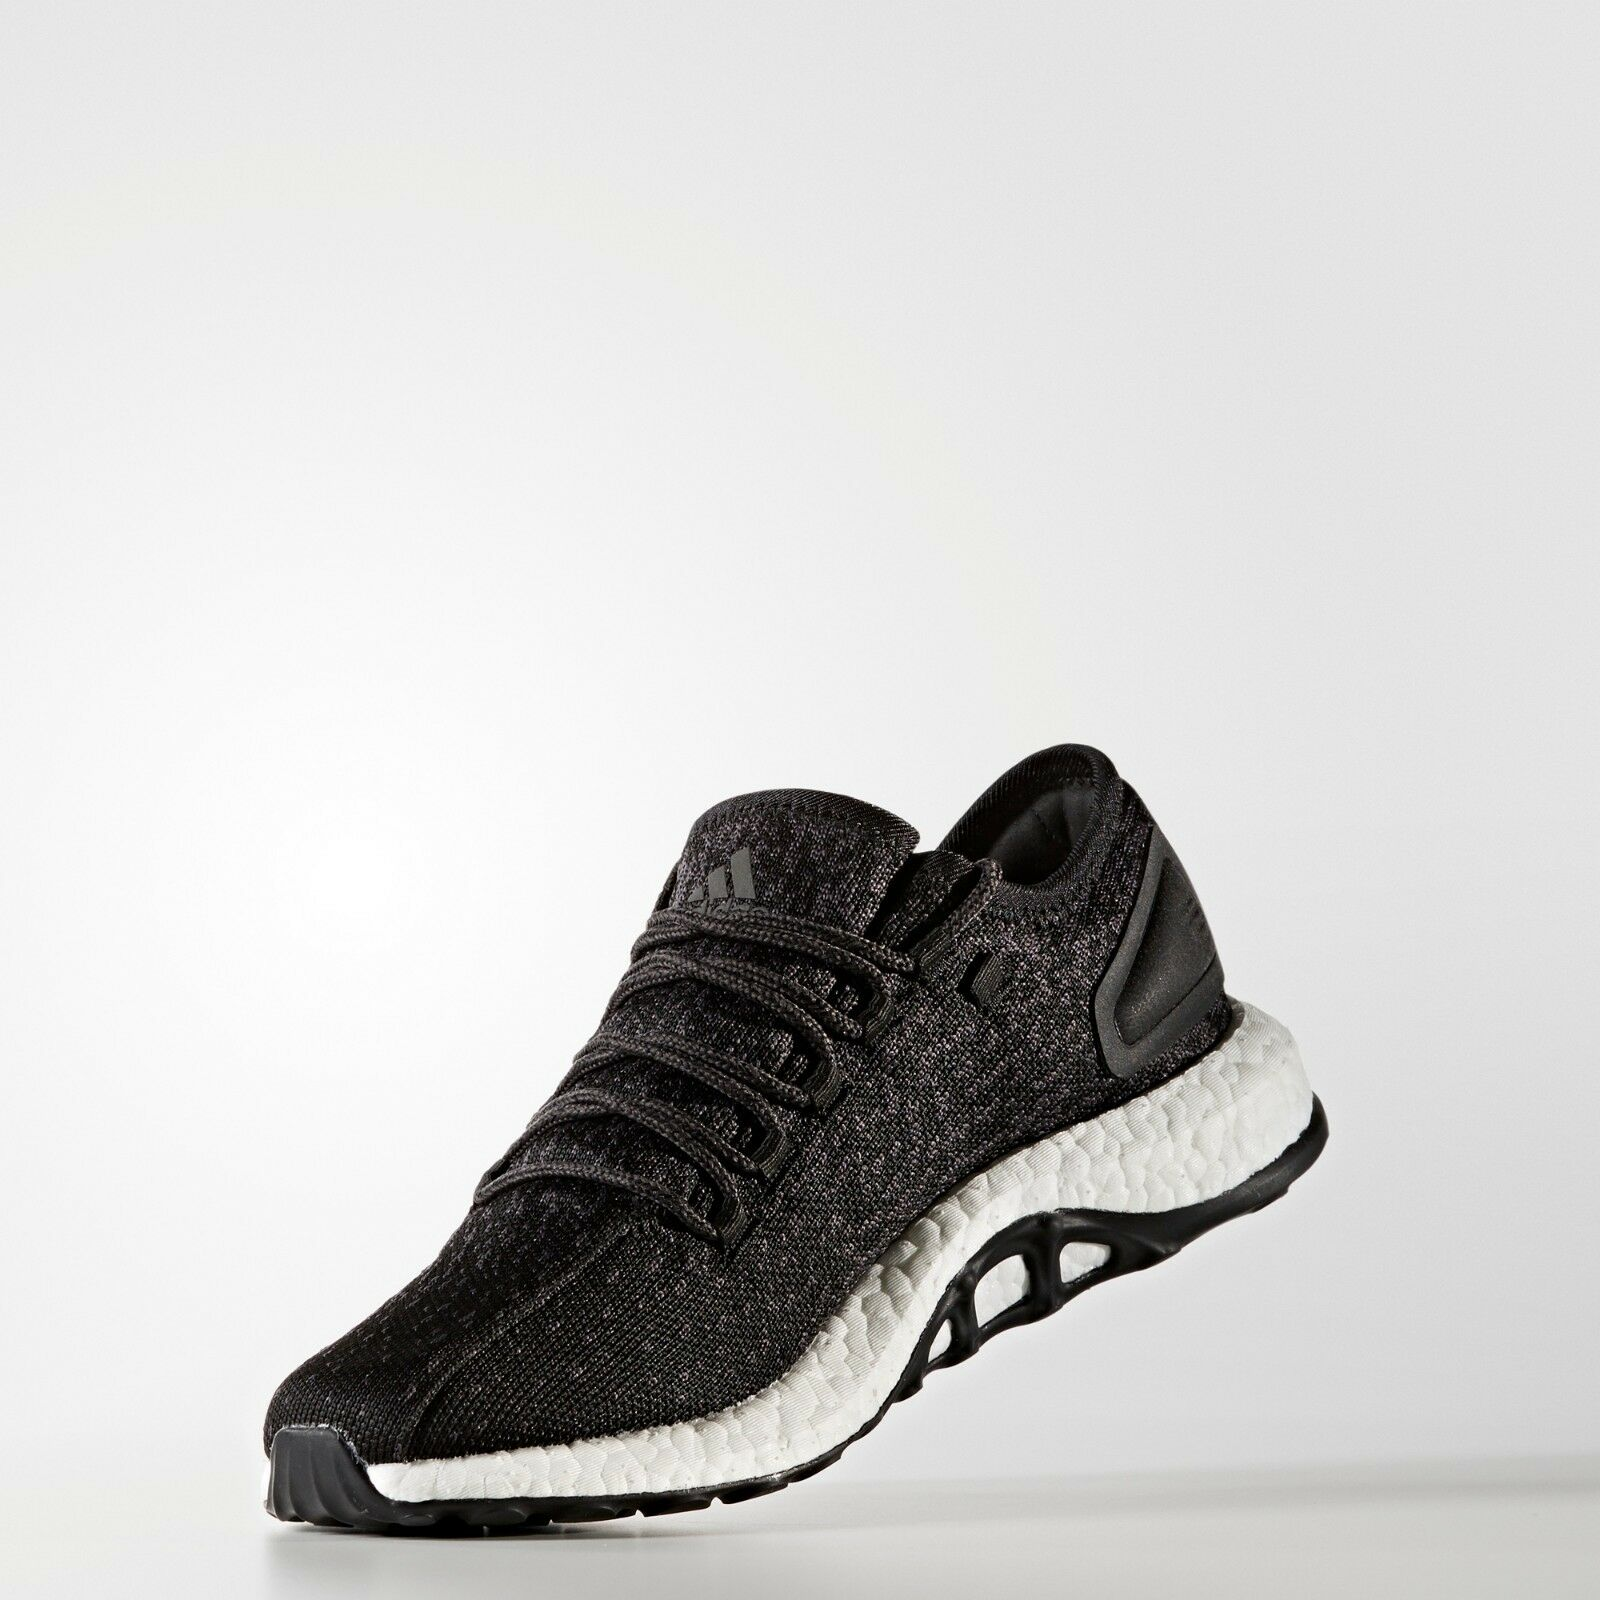 Adidas REIGNING CHAMP PUREBOOST Energy Ultra Running 11 Gym Training Shoe~Men sz 11 Running ca02ff